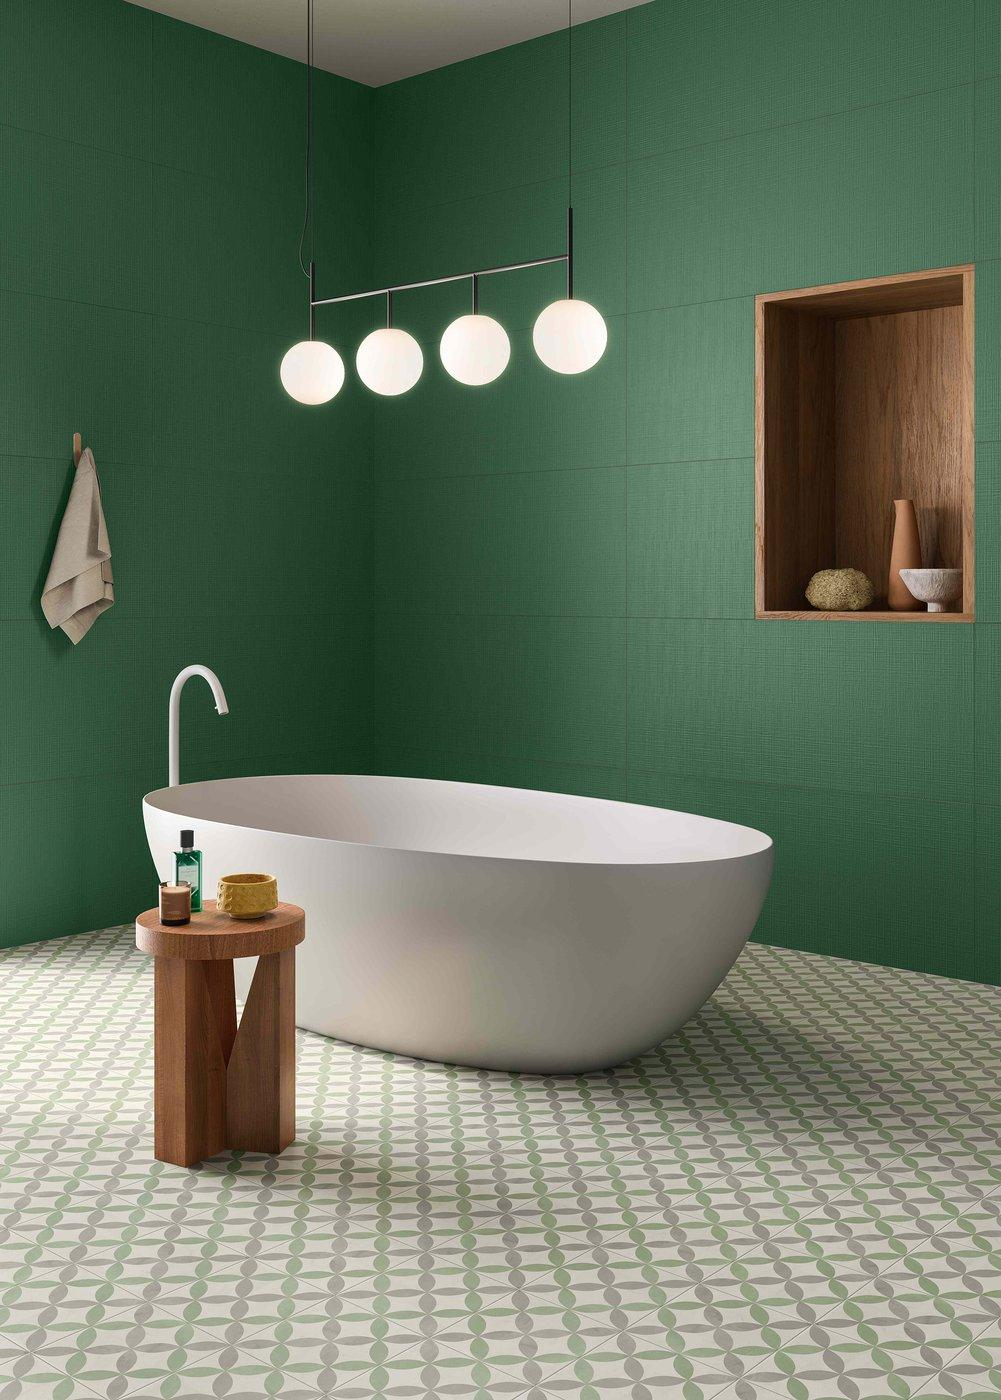 Zelená v kúpeľni - Obrázok č. 23